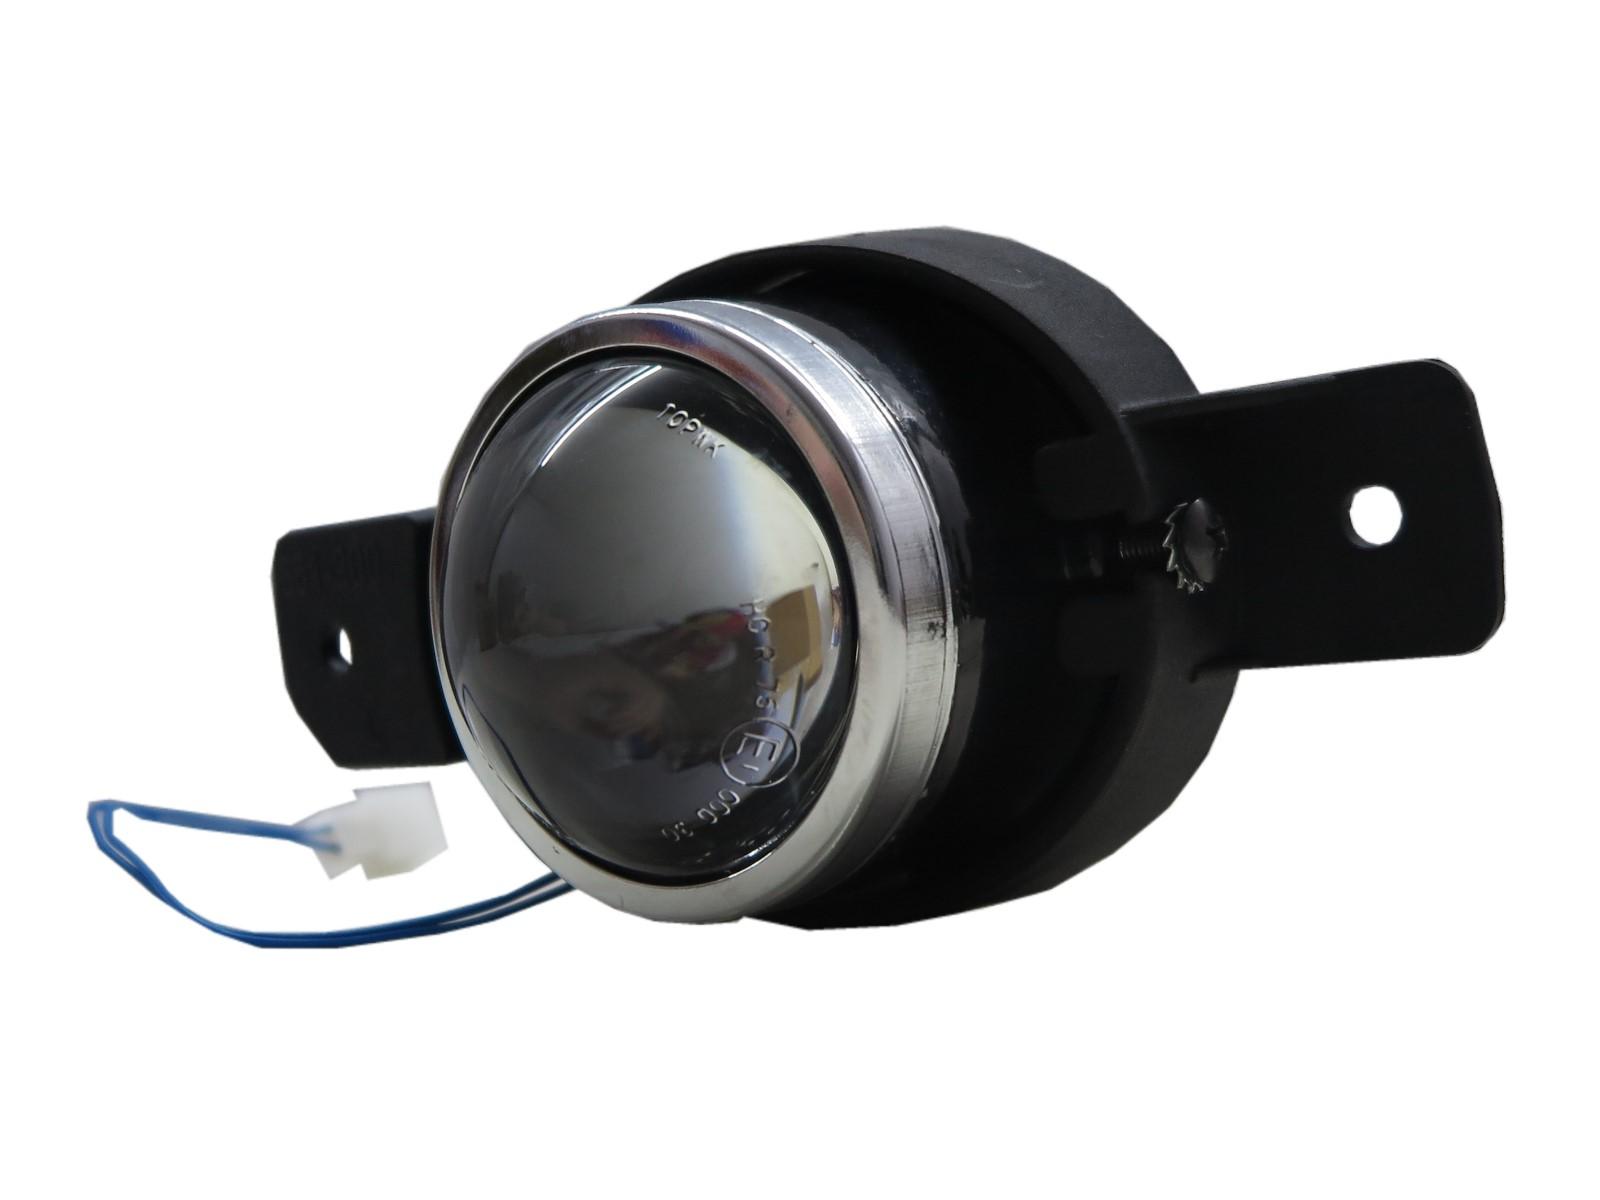 thumbnail 2 - primera P12 MK3 2001-2008 4D/5D Projector Dual Beam Fog Light Black for NISSAN